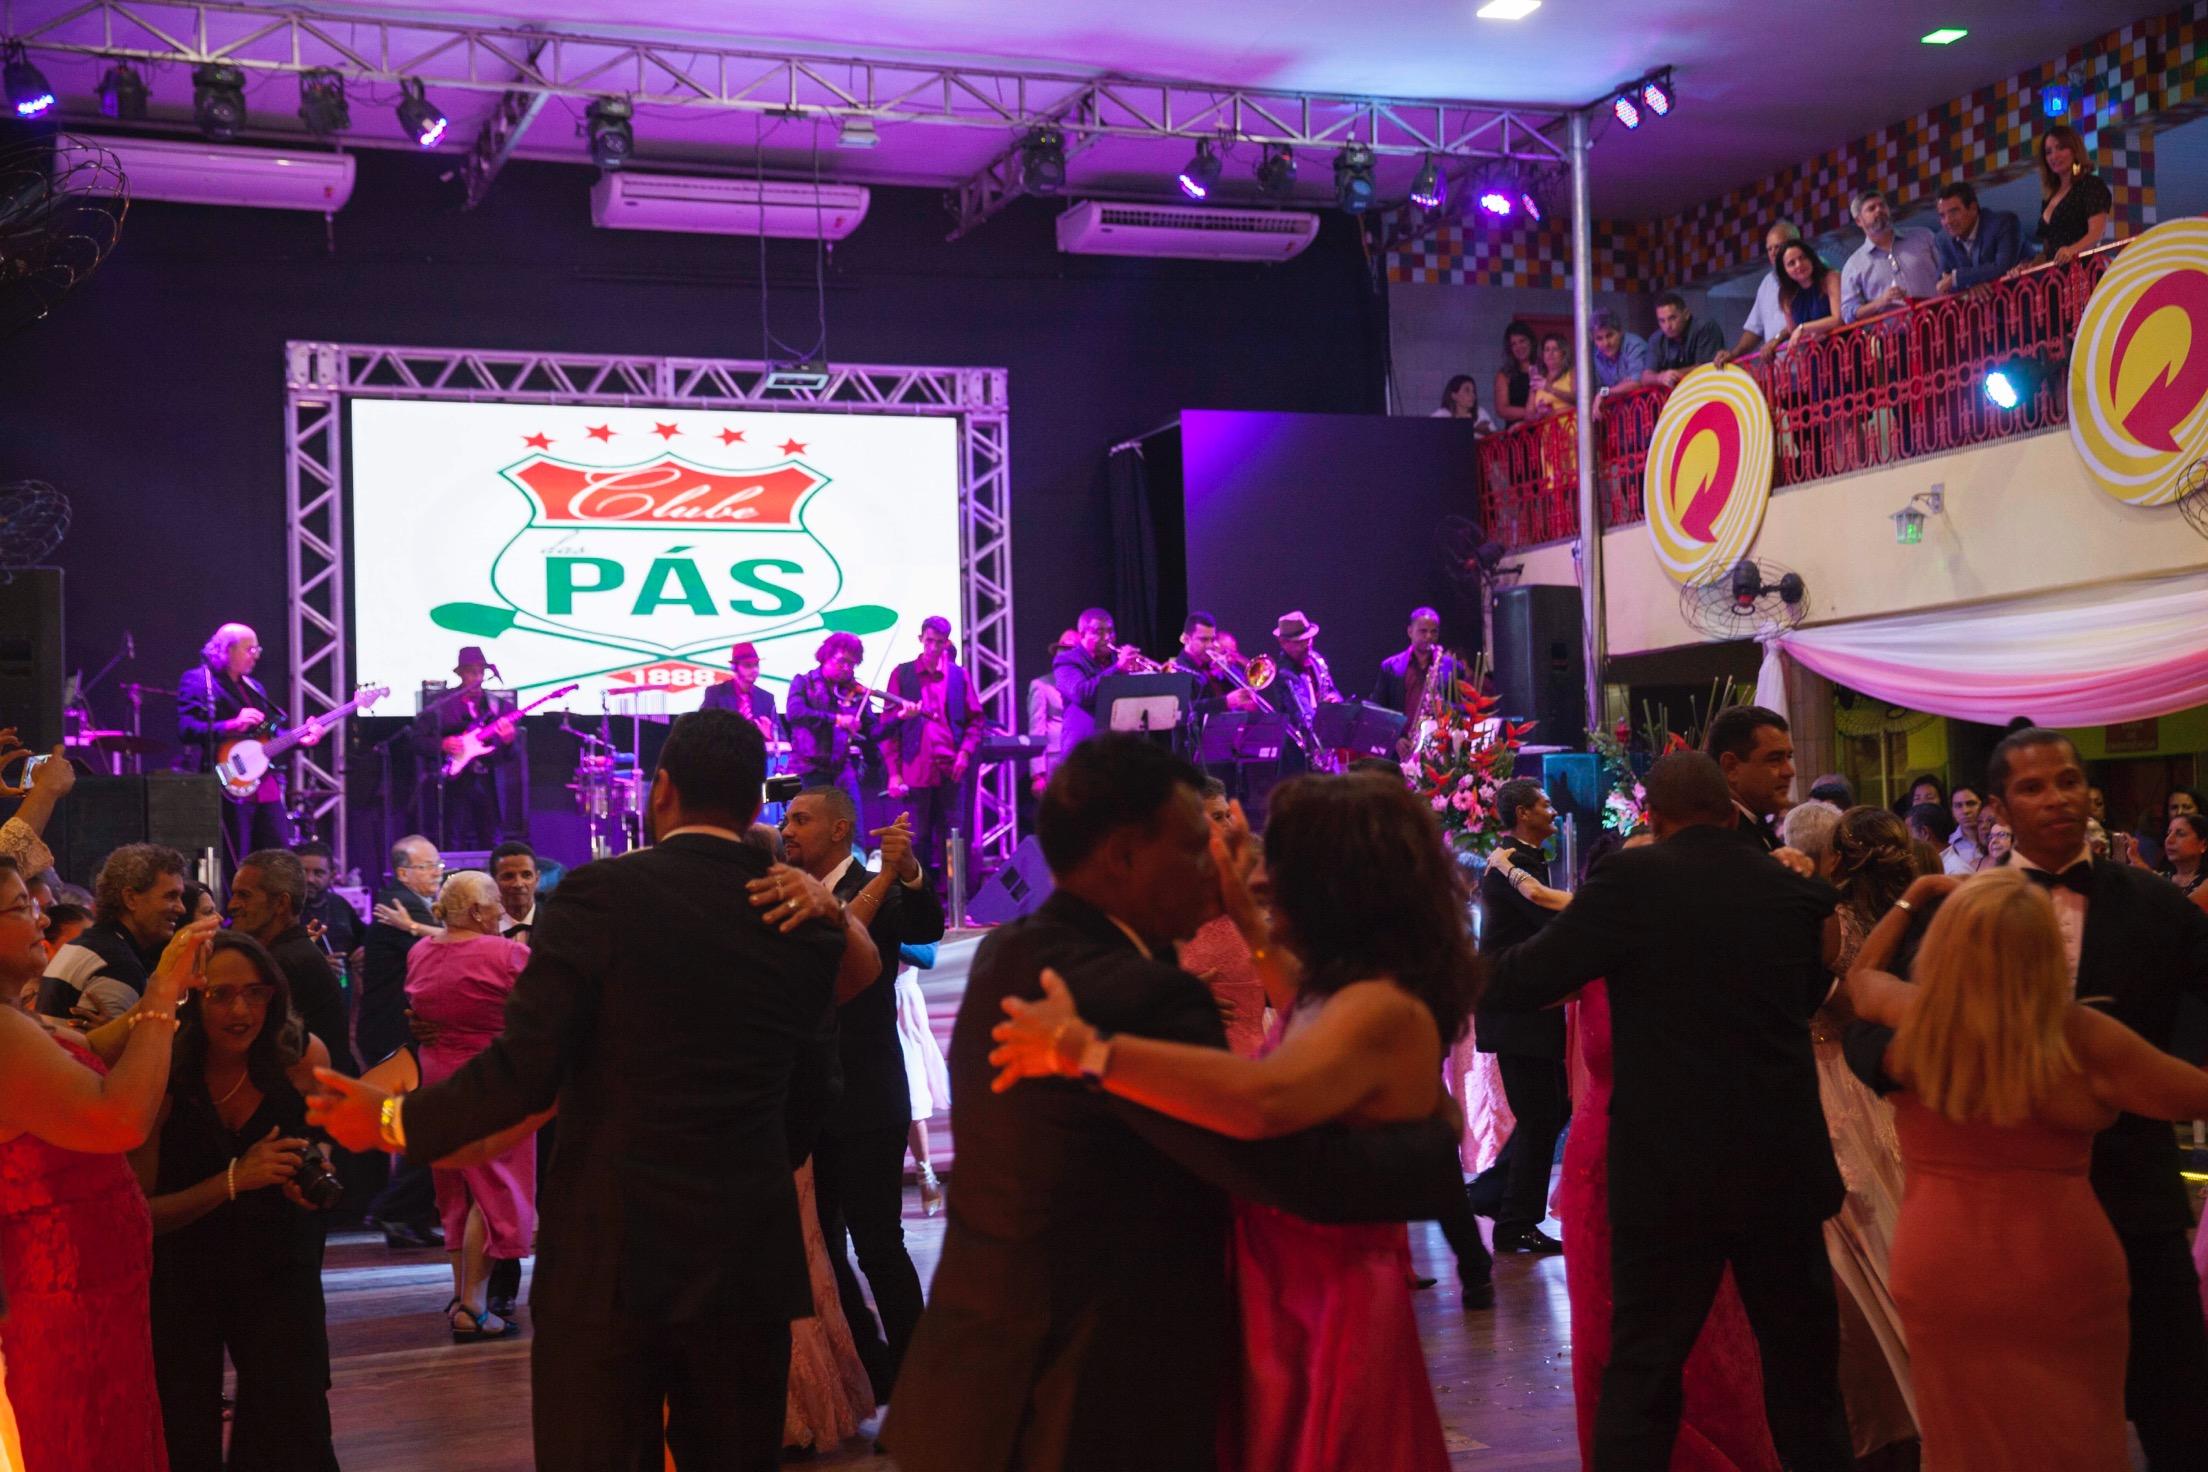 Banda Buscapé anima arraial junino, hoje no Clube das Pás